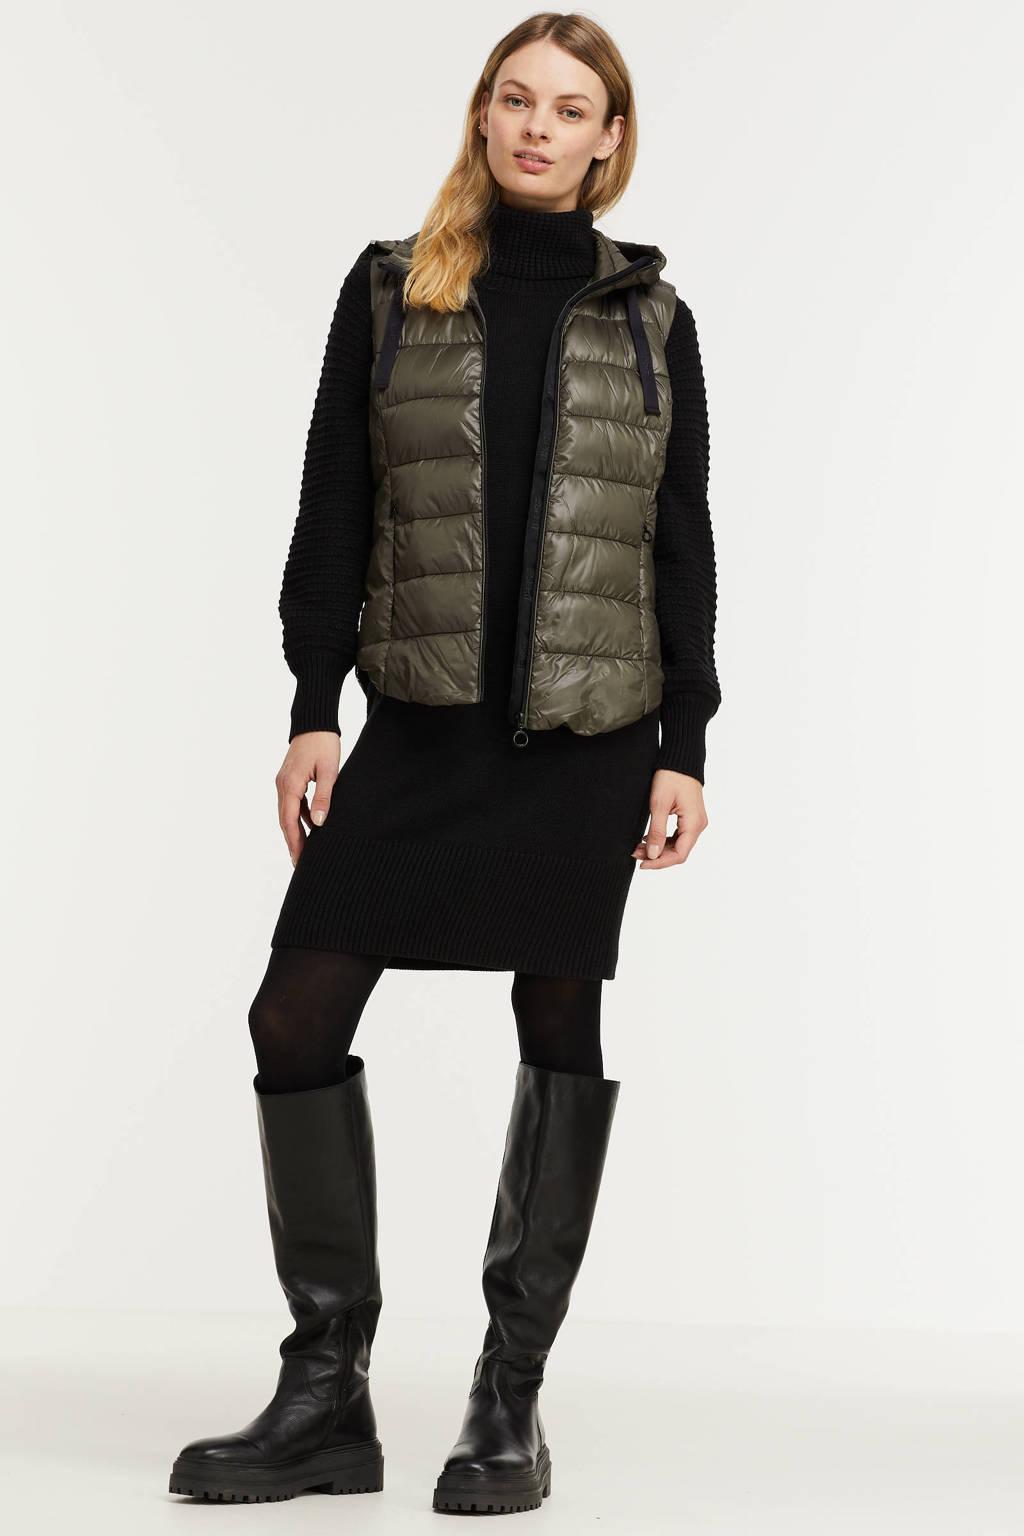 ESPRIT Women Casual bodywarmer van gerecycled polyester donkergroen/zwart, Donkergroen/zwart